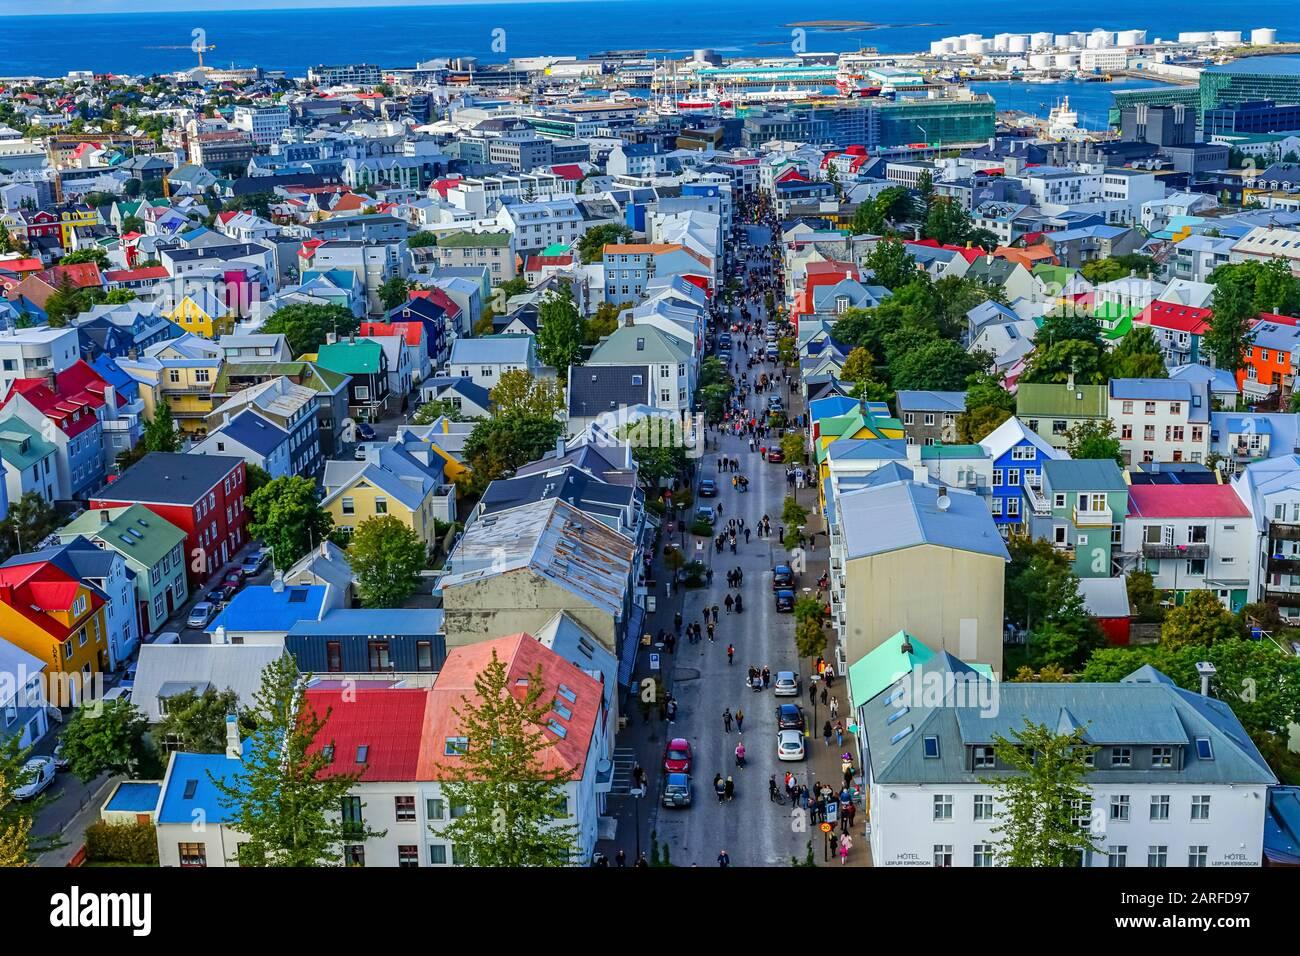 Maisons Rouges Et Vertes Colorées Voitures Rues Commerçantes Port Reykjavik Islande. Banque D'Images